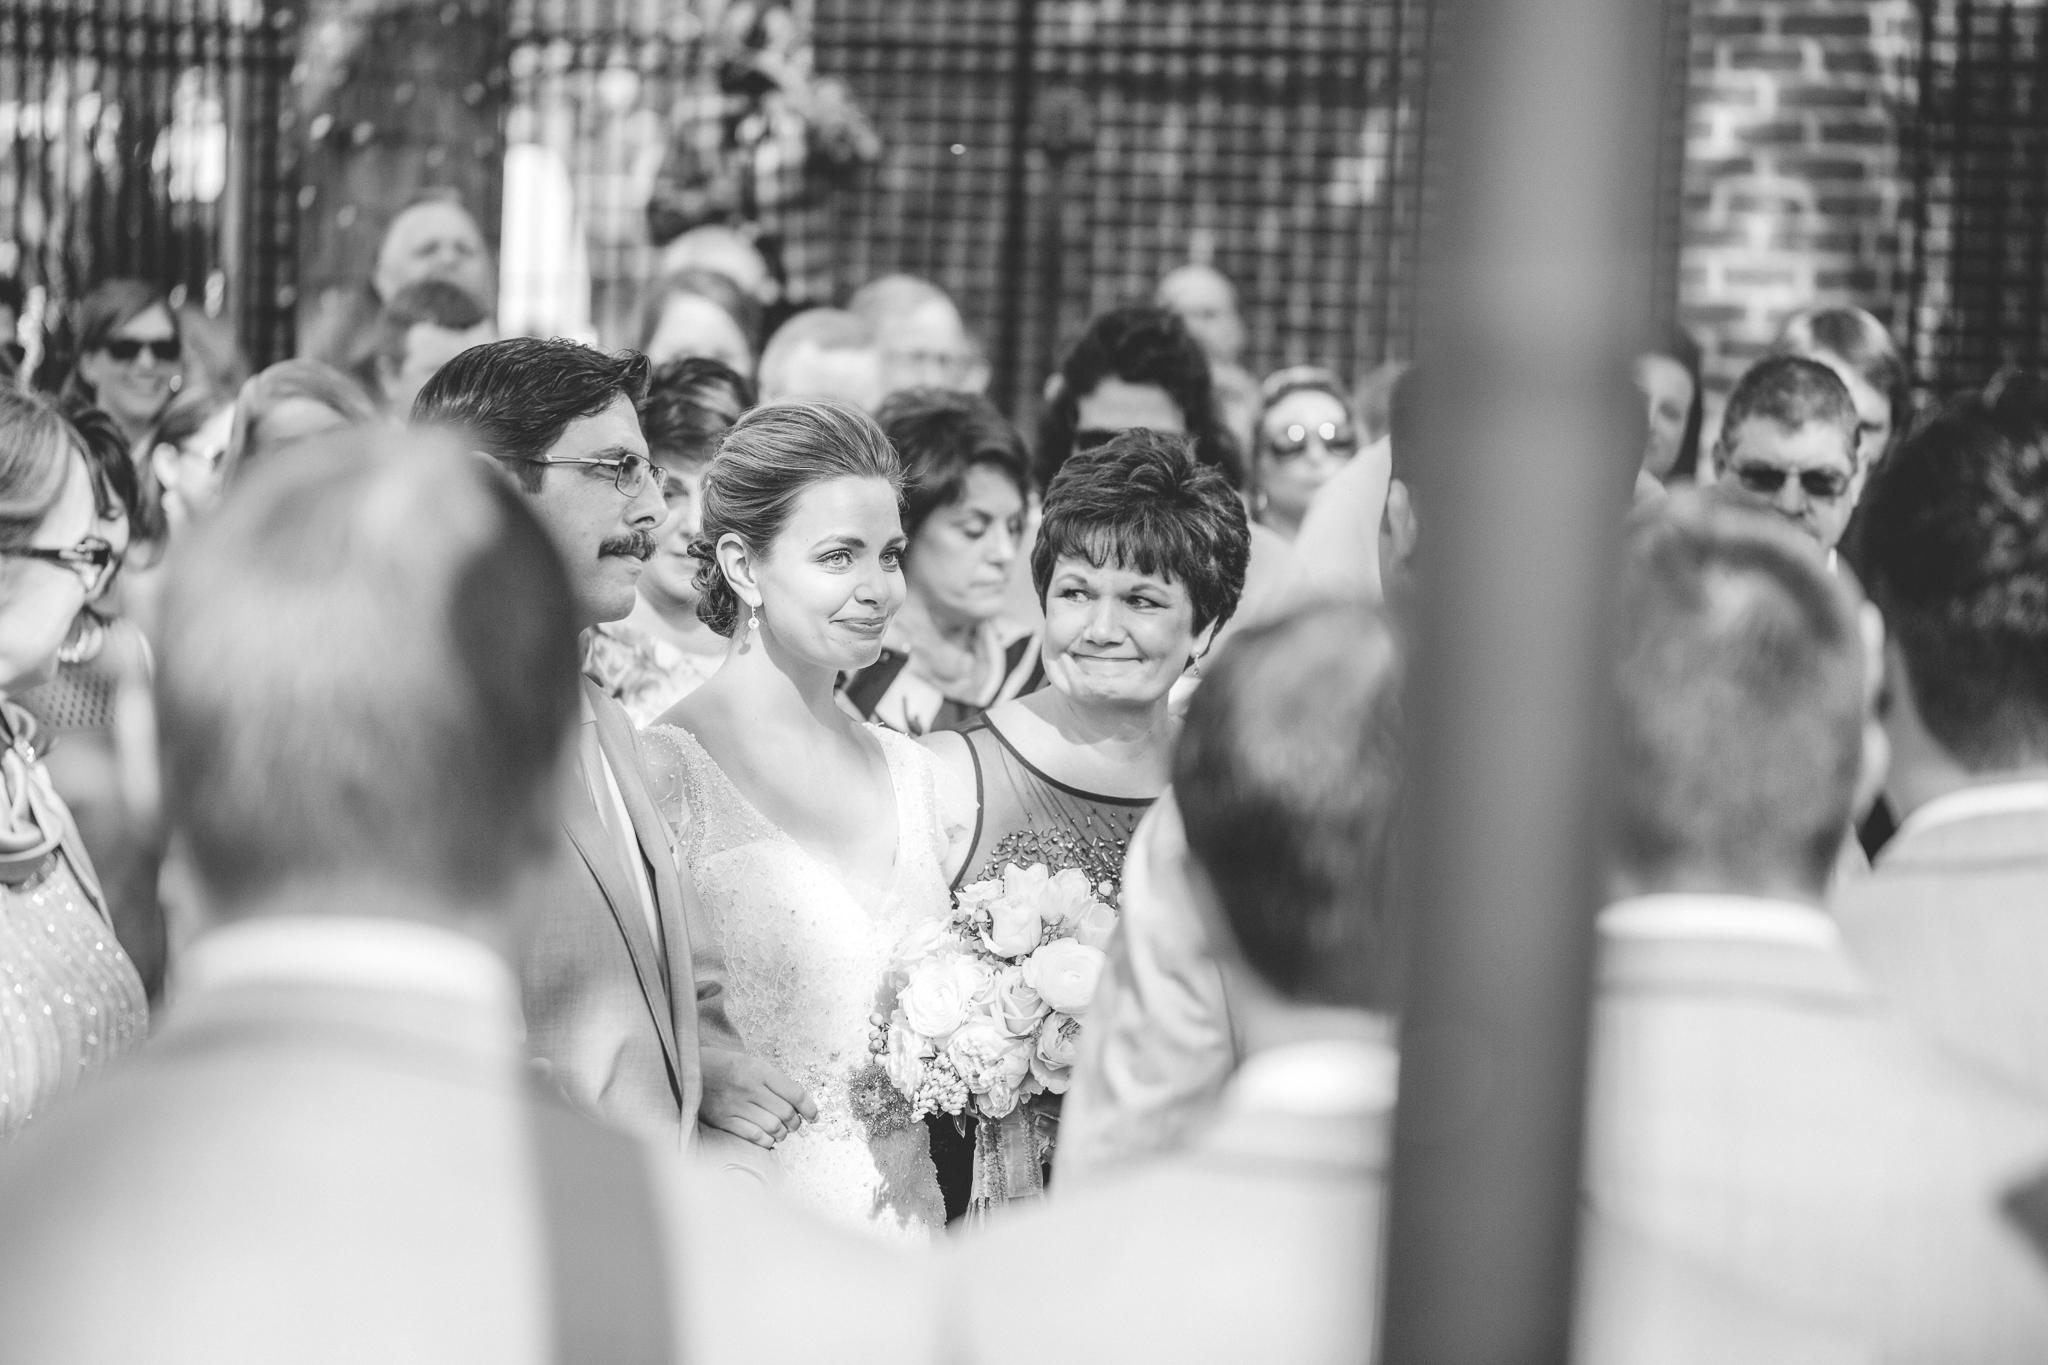 minneapolis event center wedding photographer-15.jpg